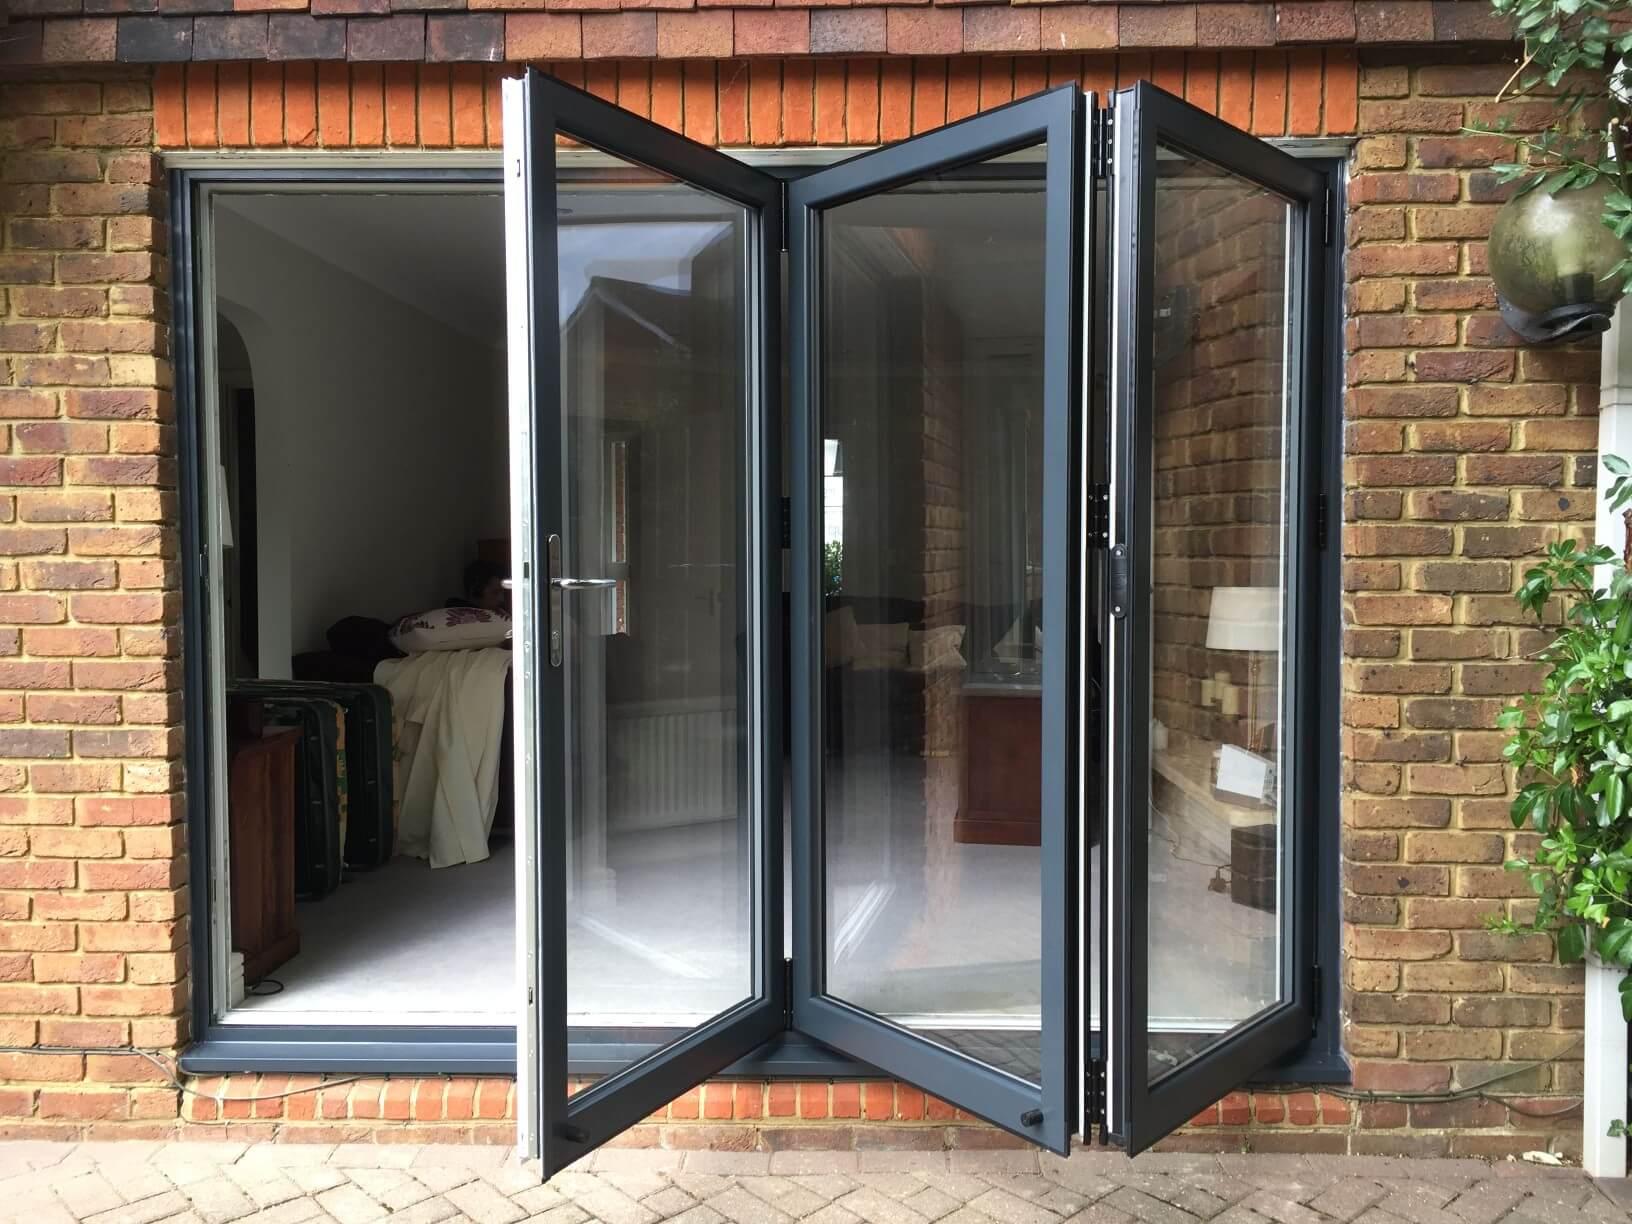 Aluminium Bifold Door Style in Croydon